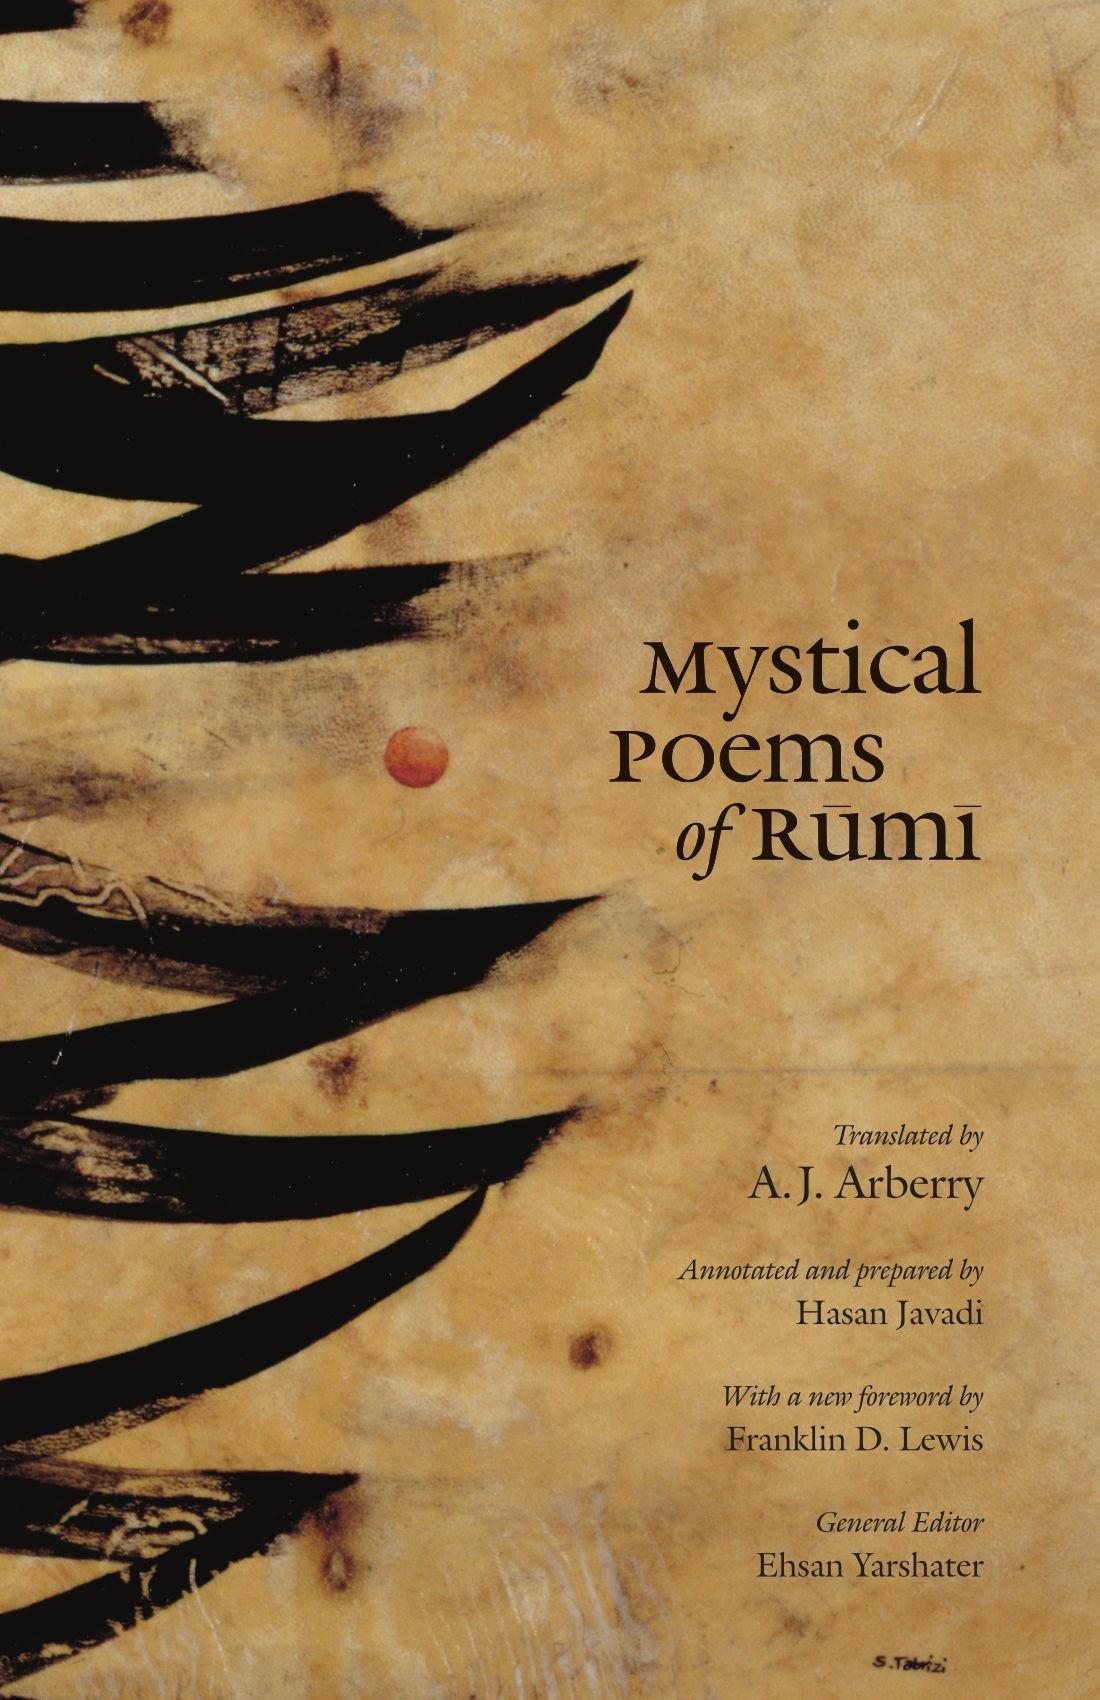 Rumi art